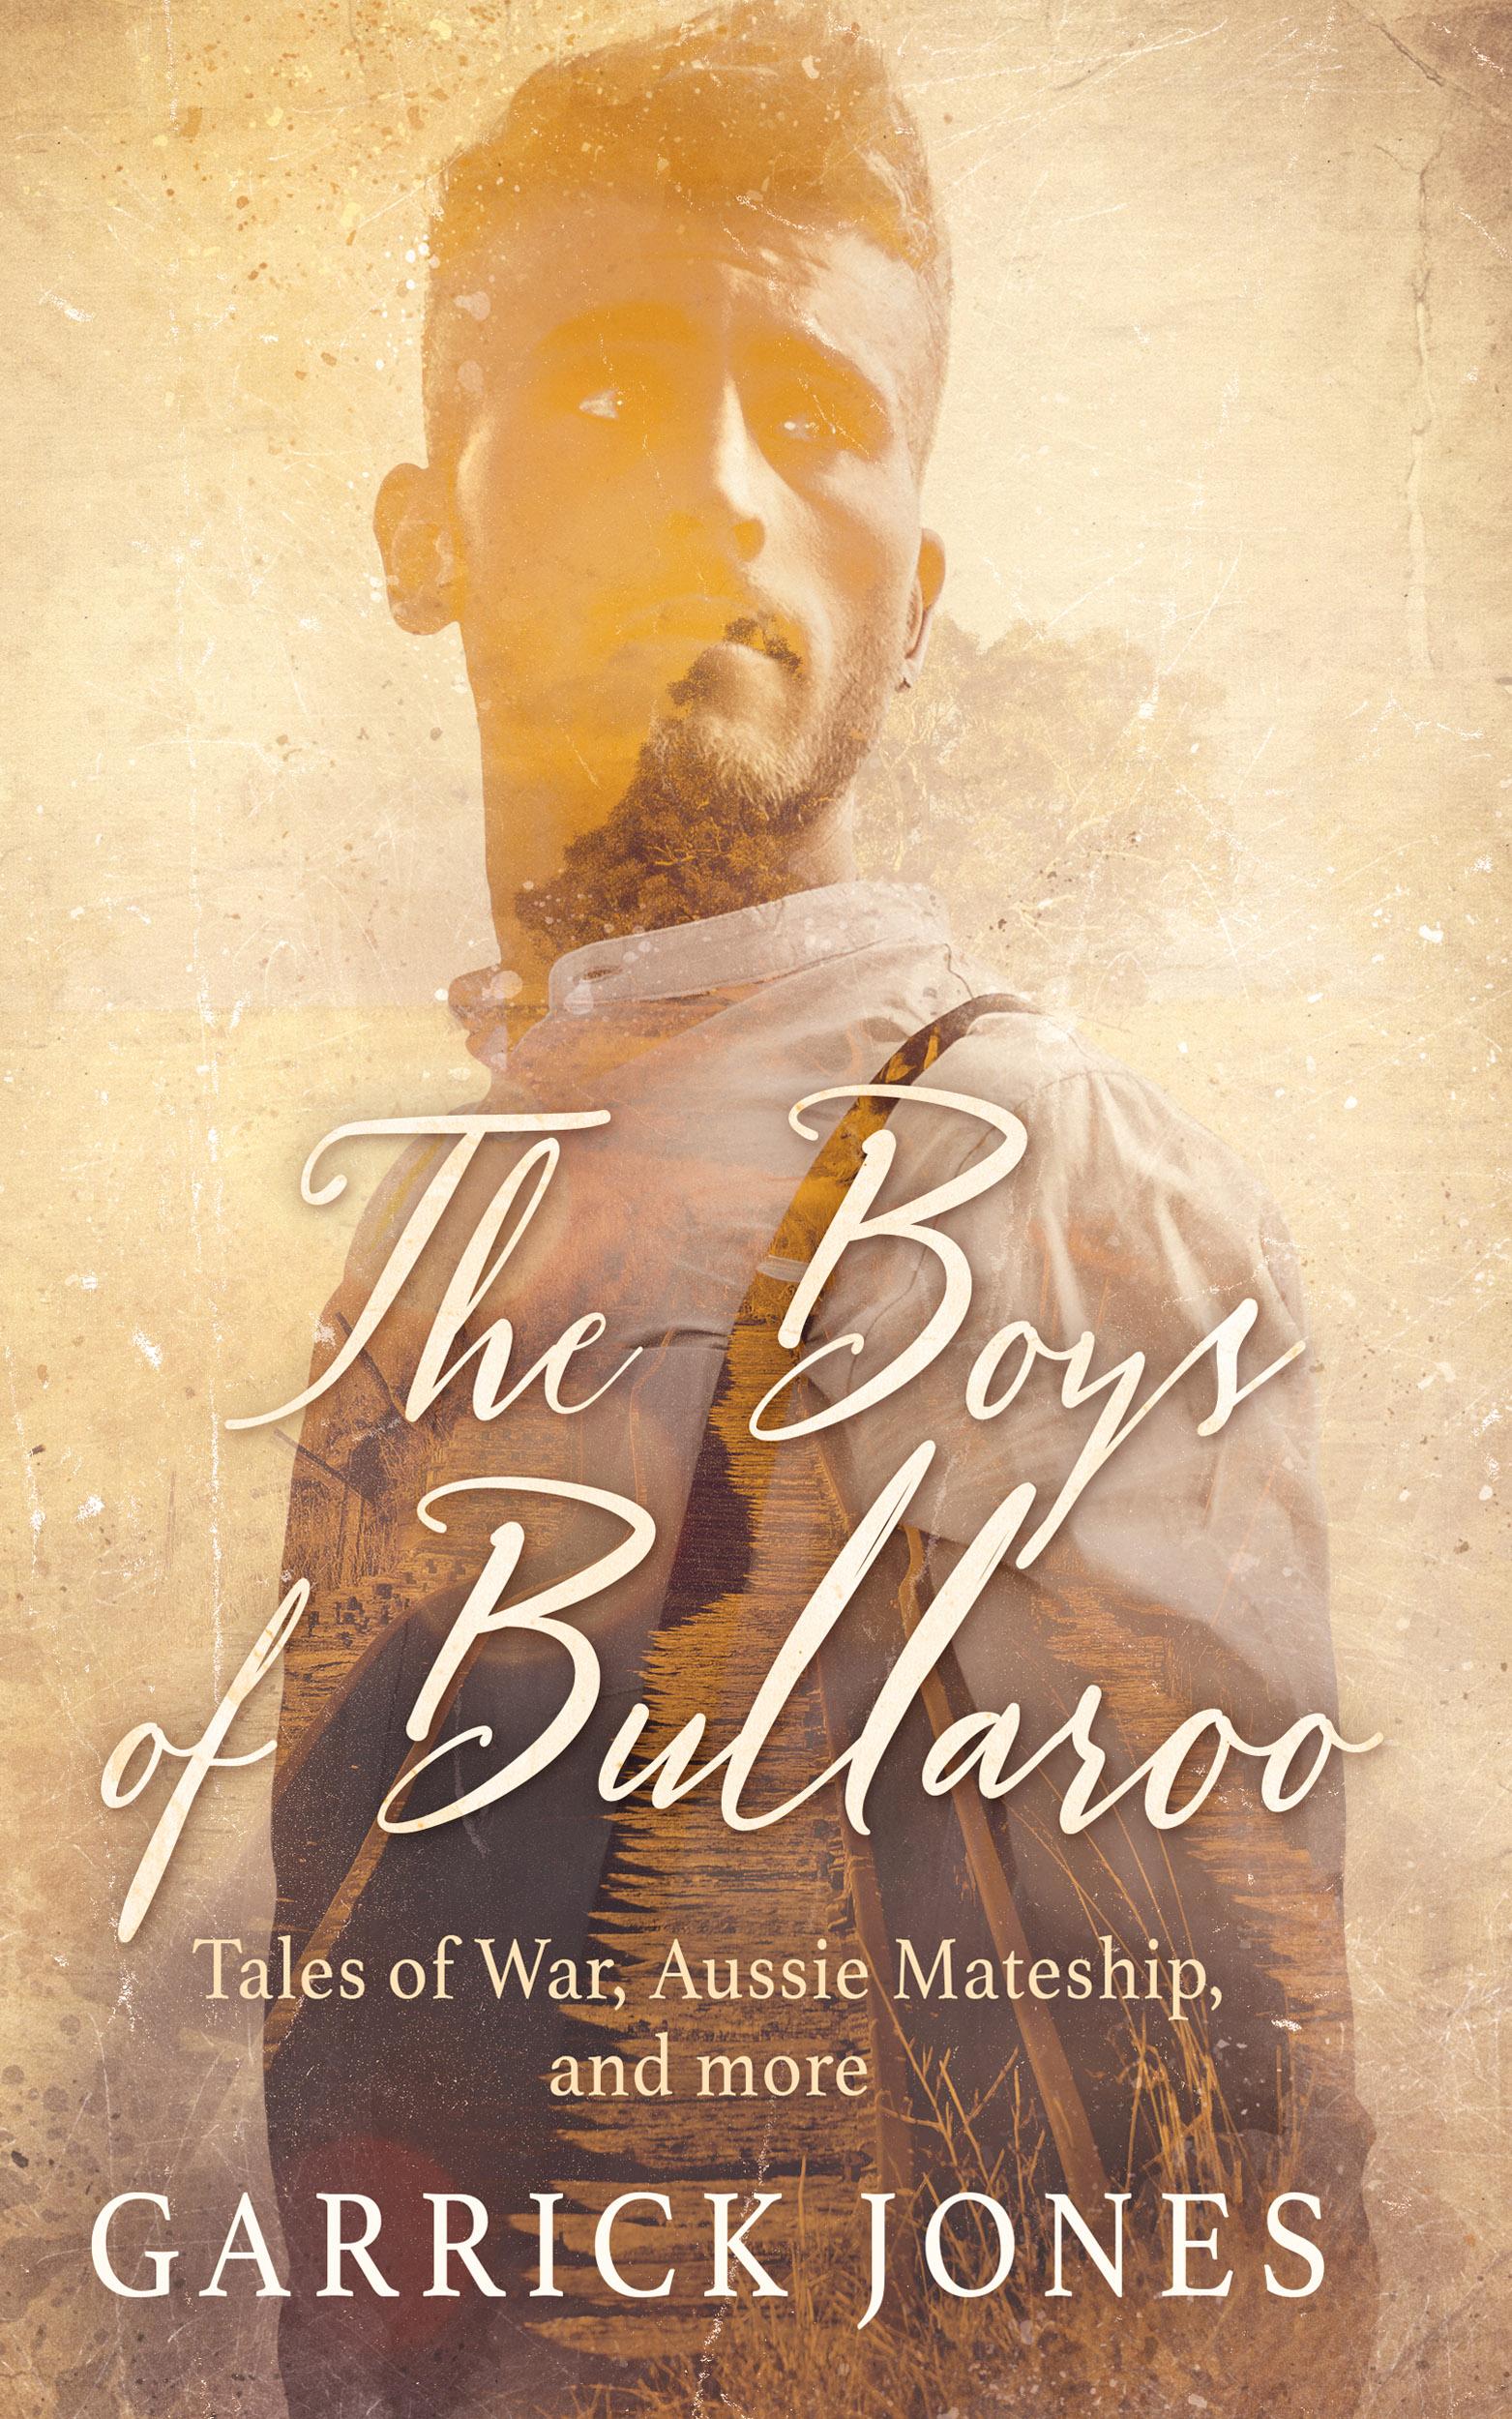 Boys of Bullaroo